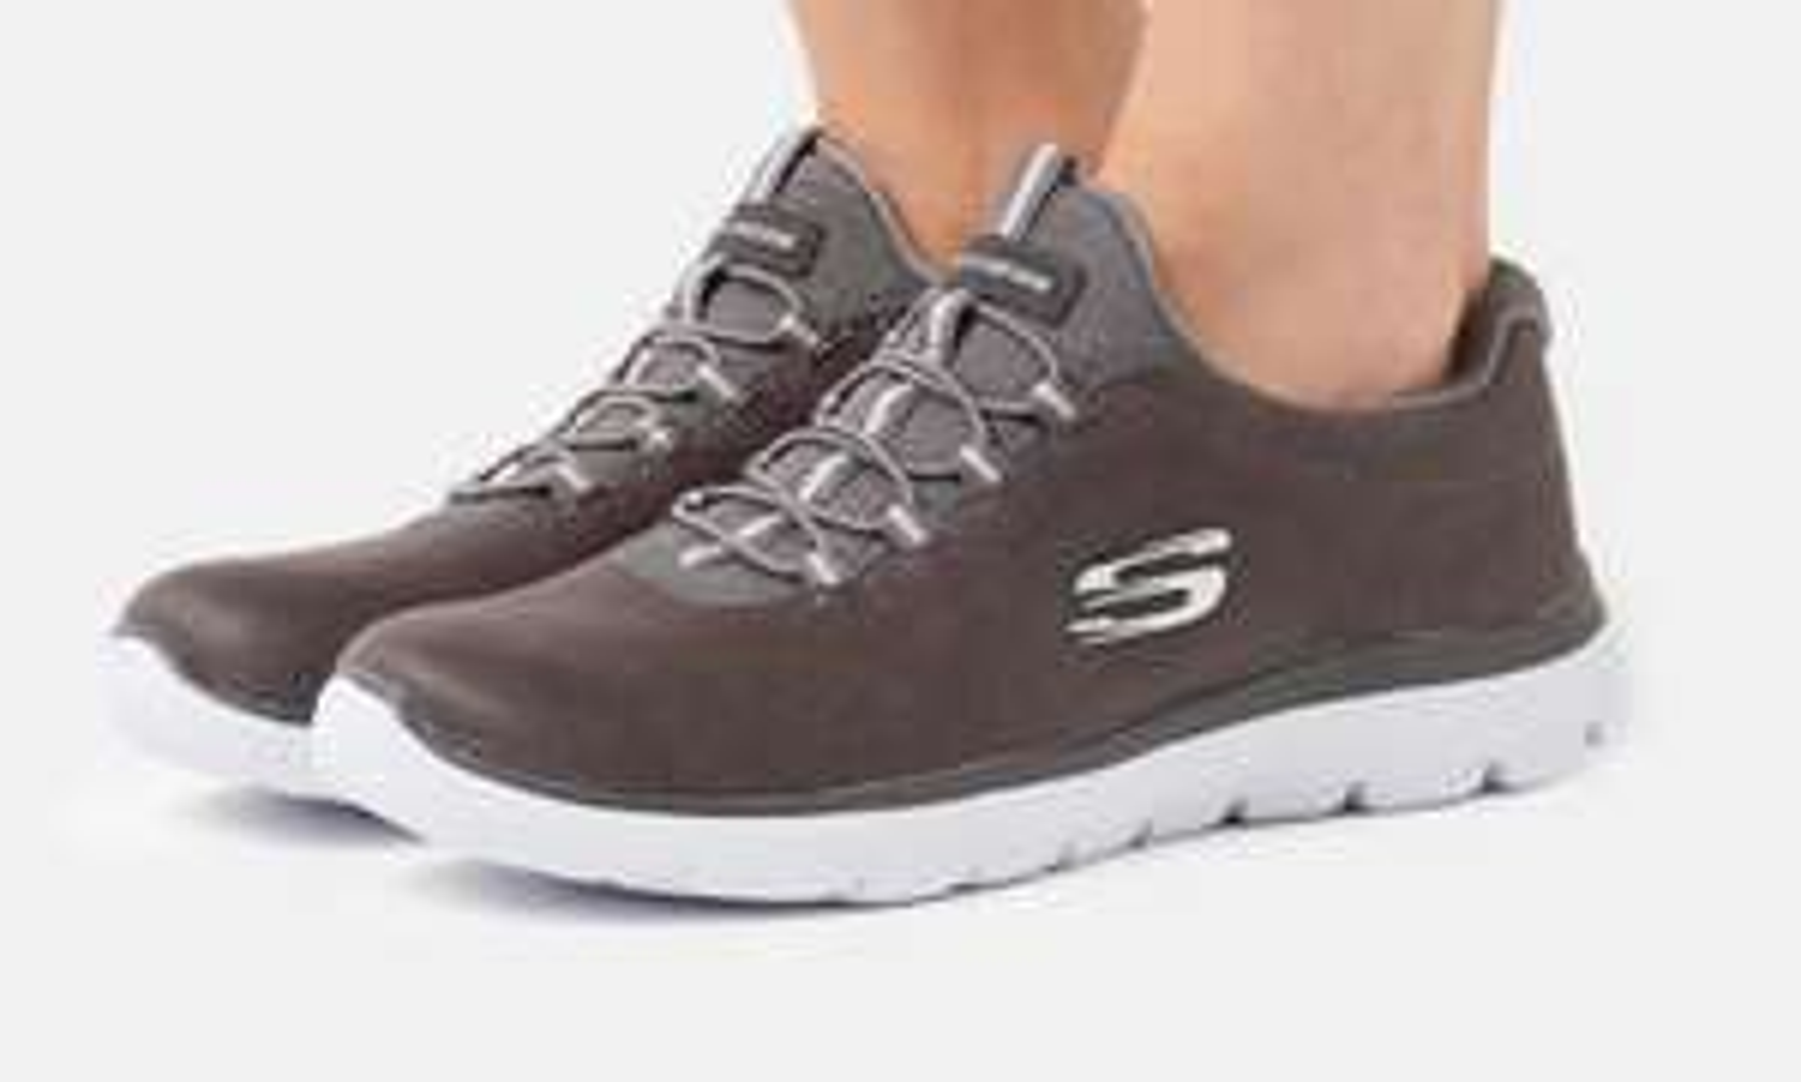 Skechers Sport SUMMITS - Sneakersy niskie damskie - r.36-41